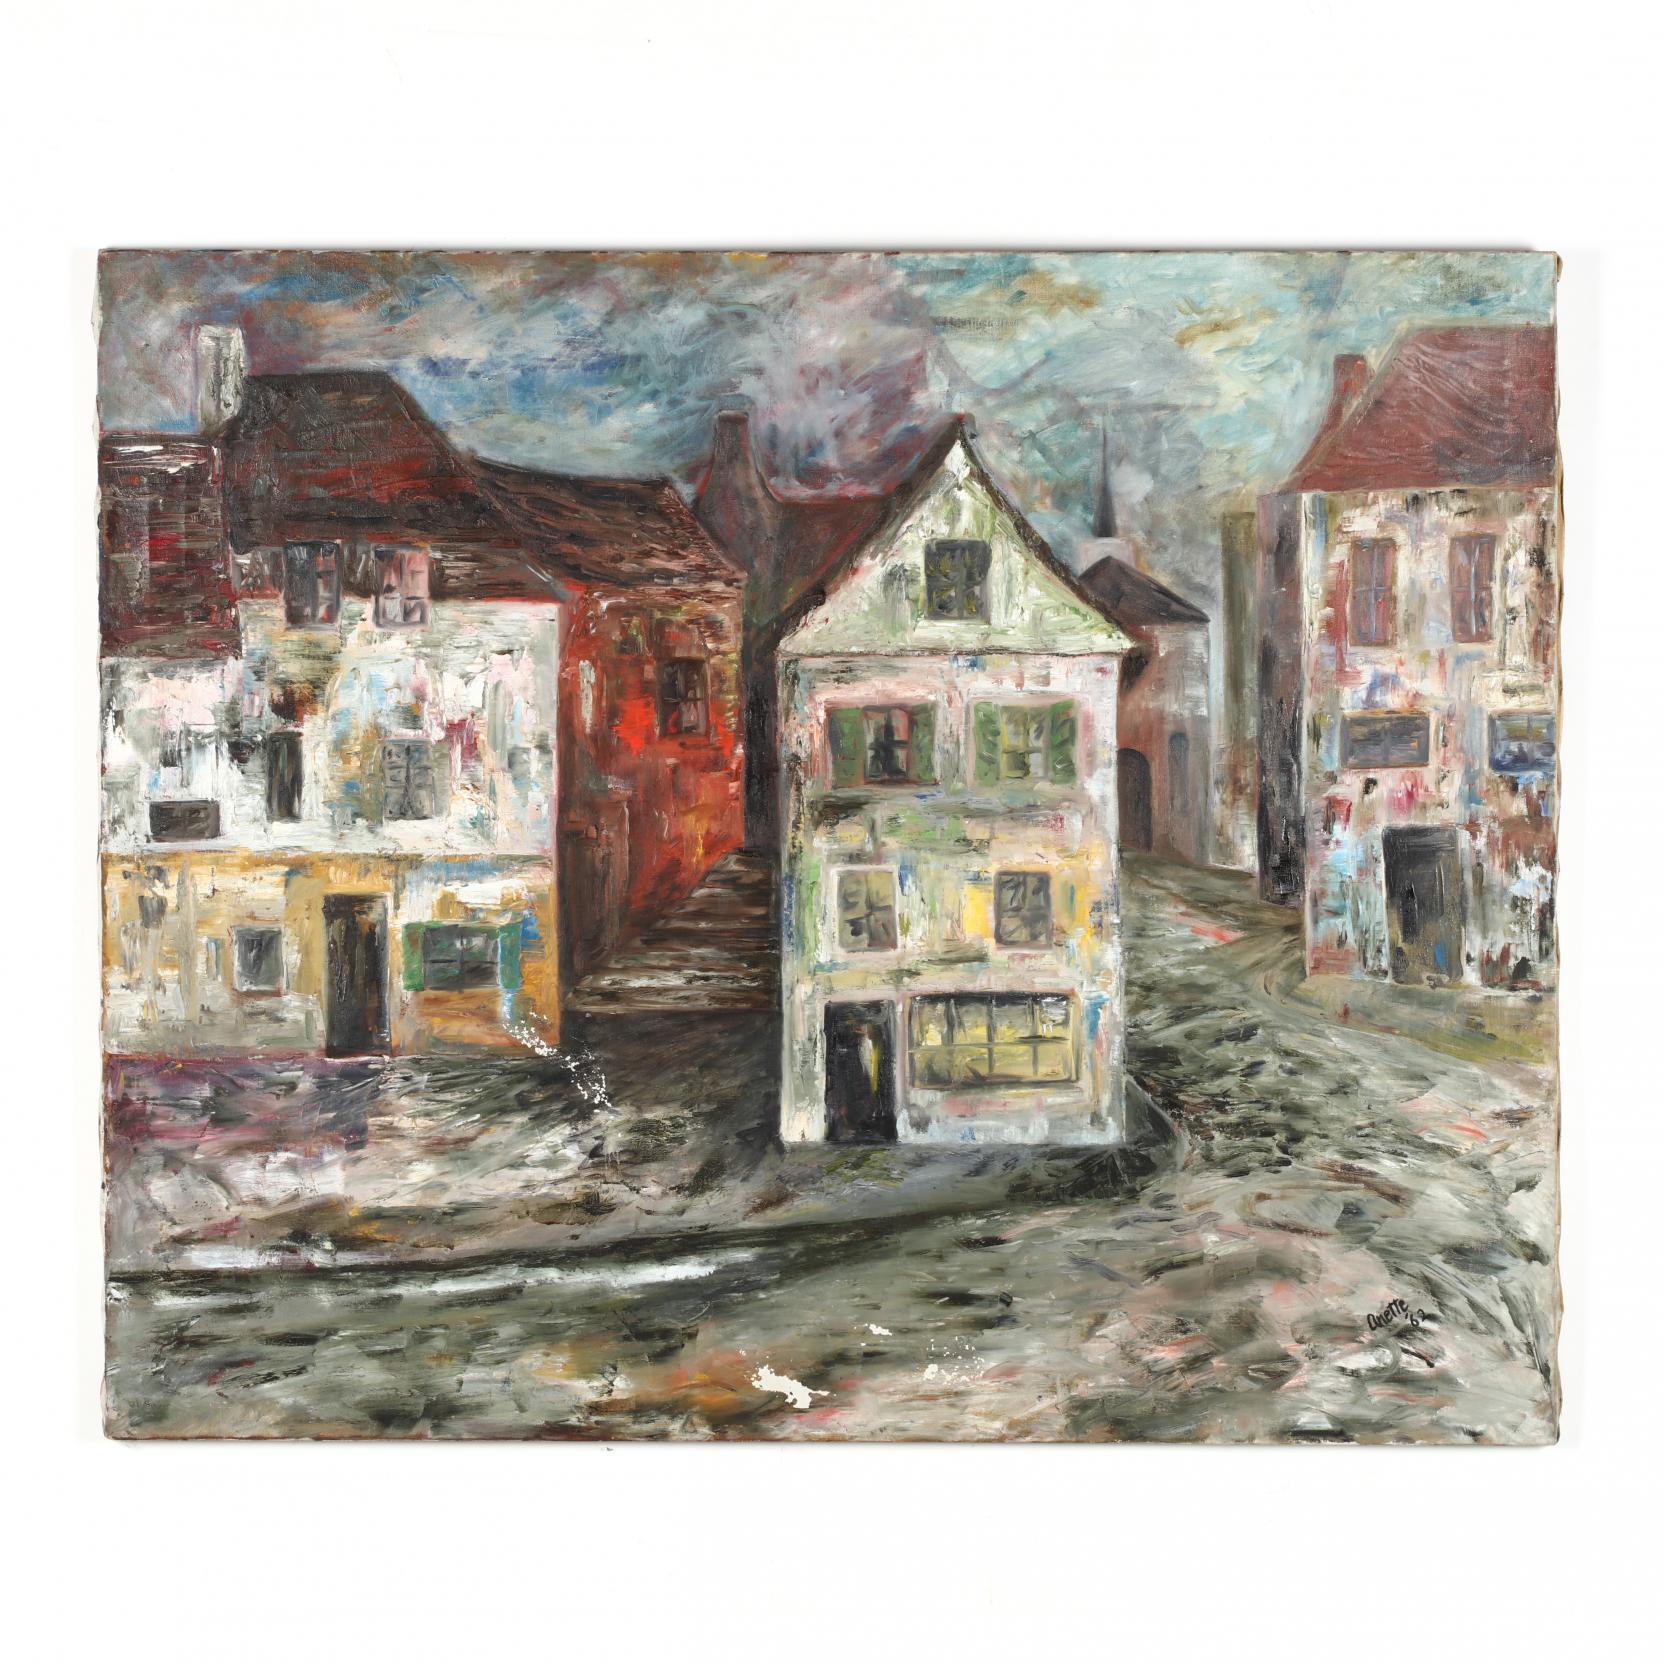 anette-thorup-20th-century-city-street-scene